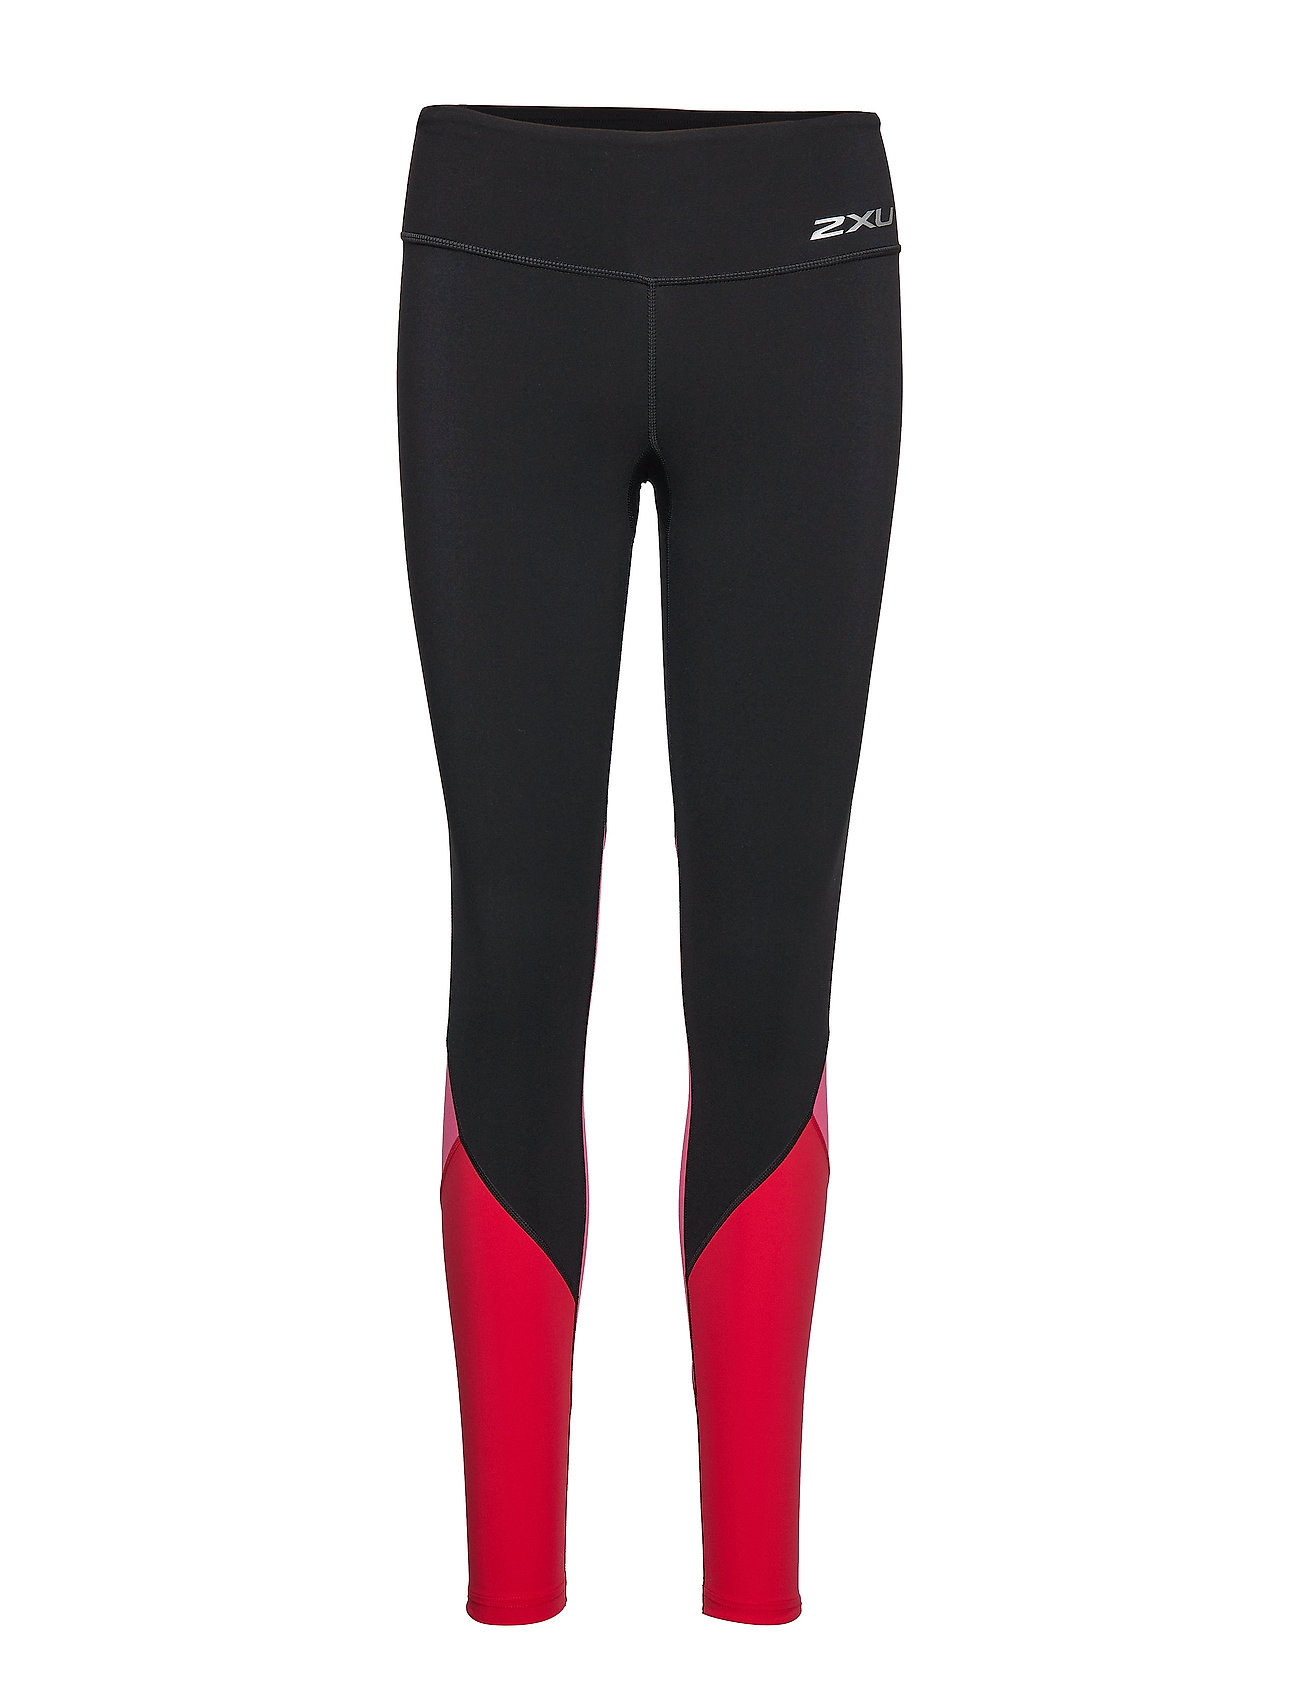 2XU Fitness Stride Comp Tights-W - BLACK/FUCHSIA LIPSTICK RED